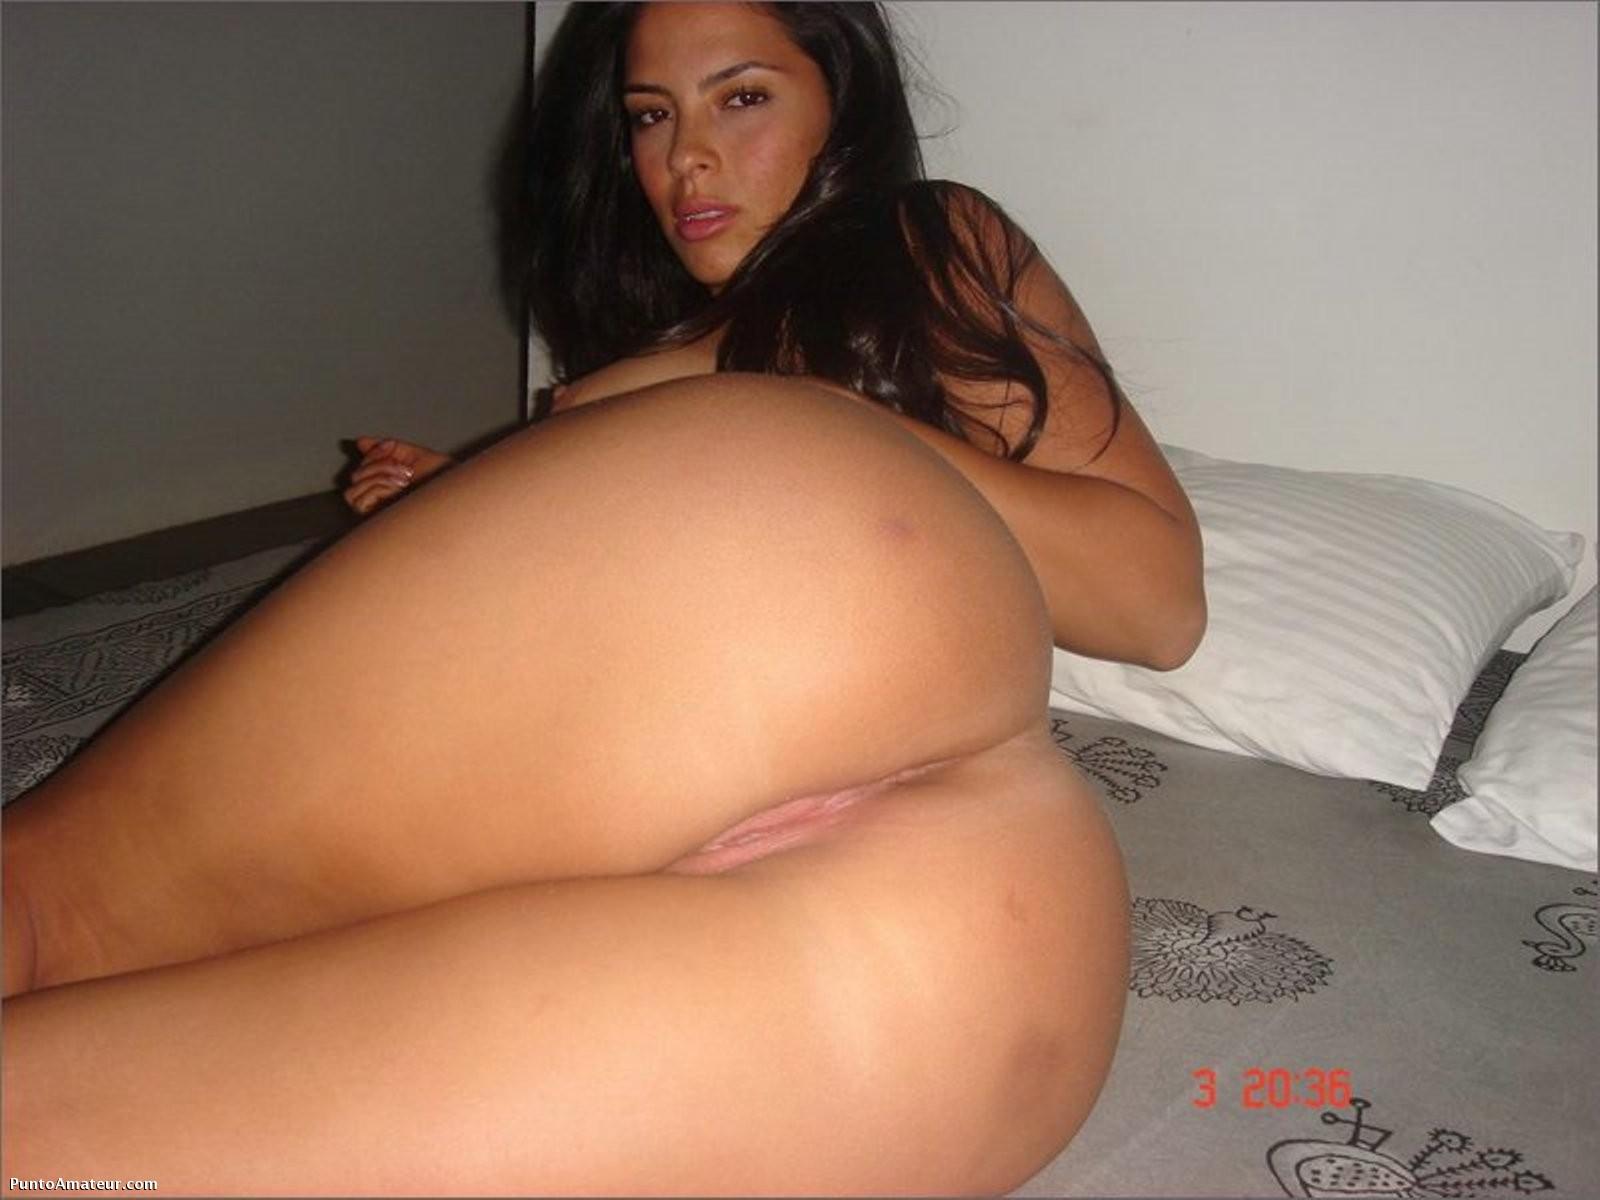 Latina tetona y juguetona sacandose fotos xxx Autofotos de una latina culona muy sabrosa